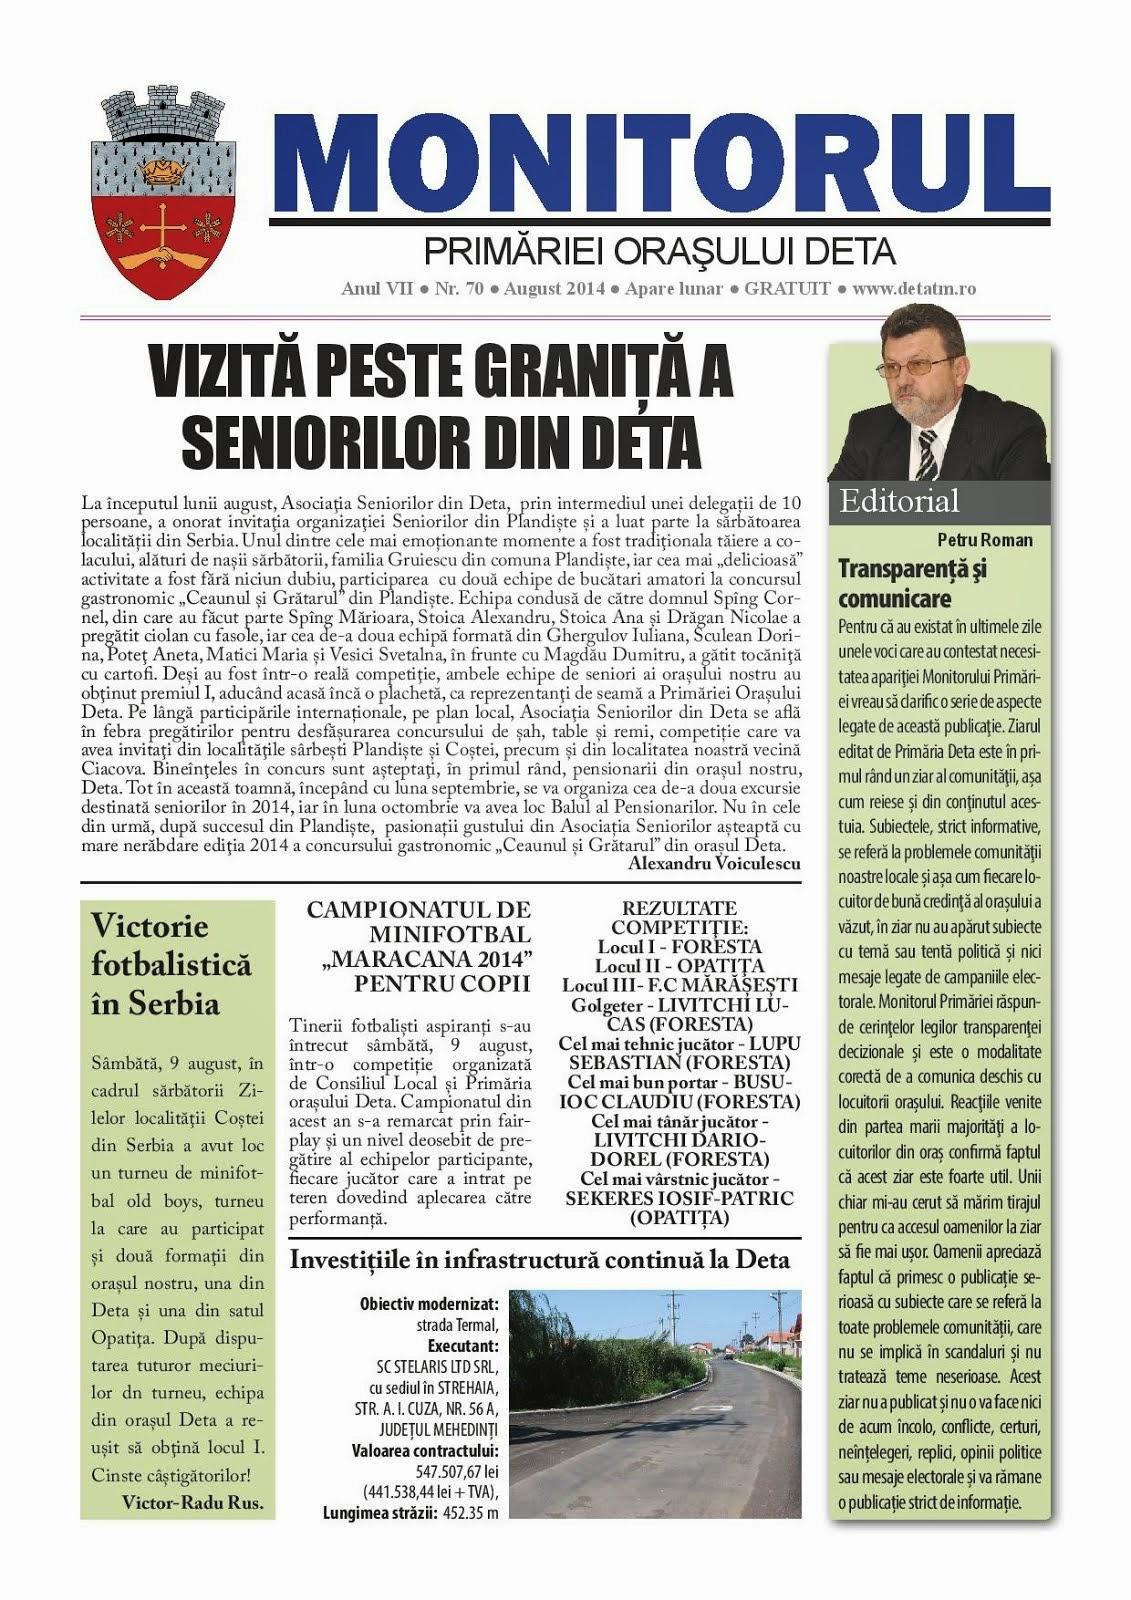 Monitorul - august 2014